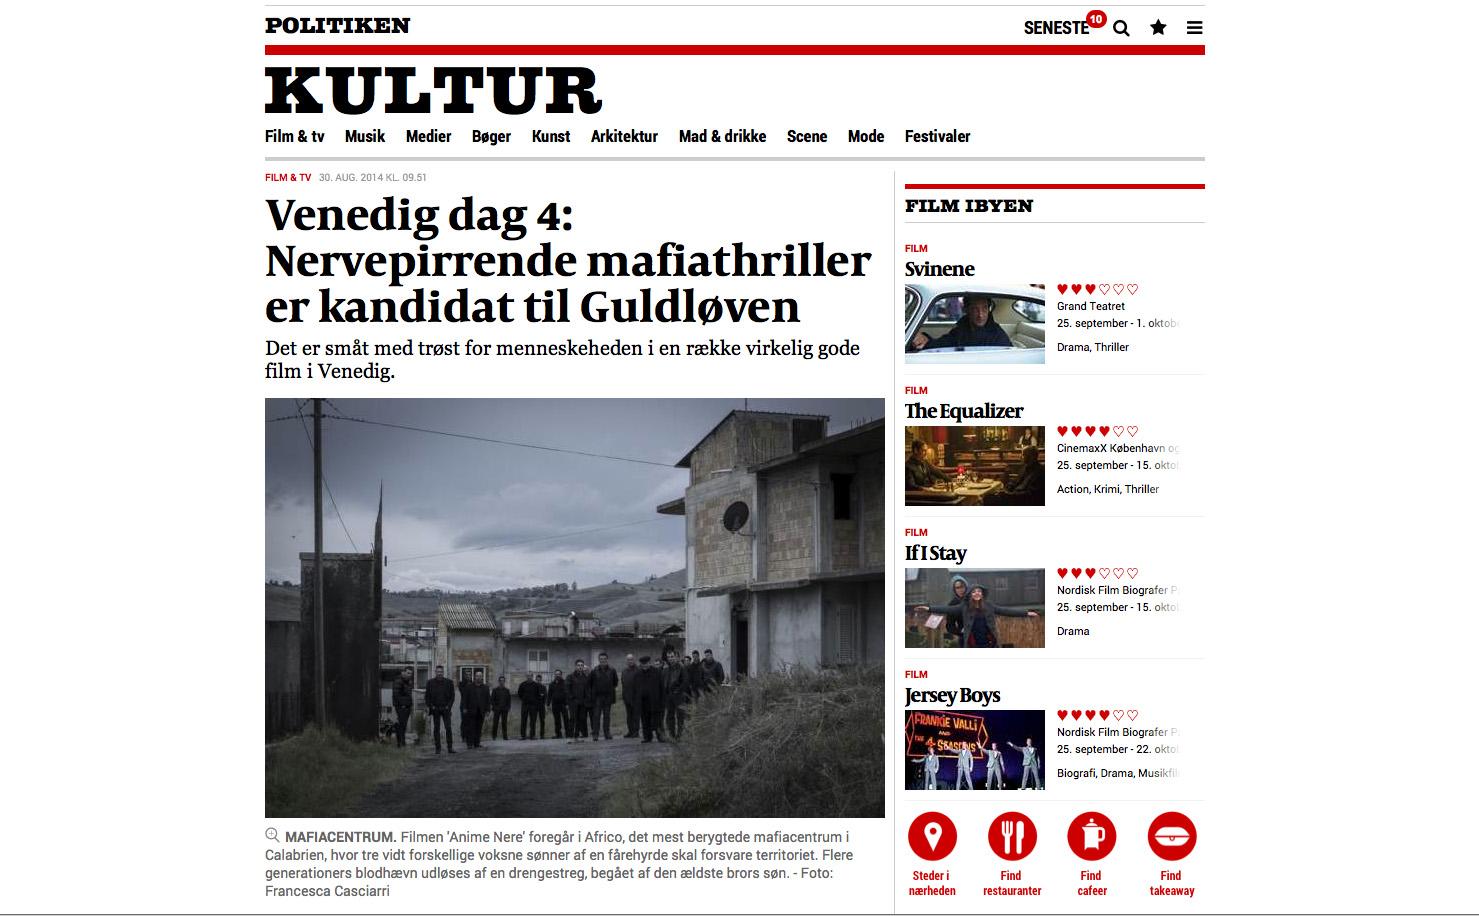 Politiken 8-2014 (Denmark)